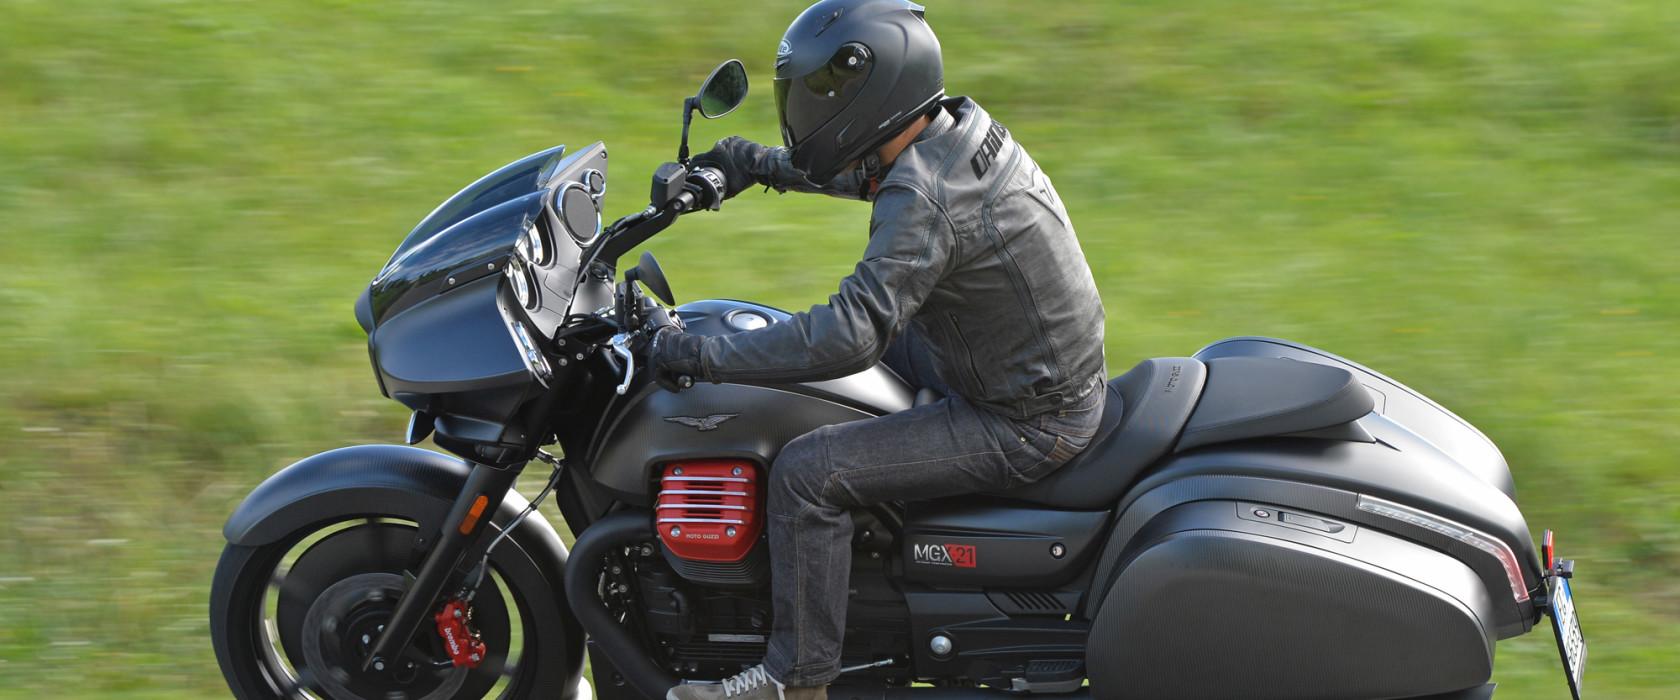 Moto Guzzi MGX21-17